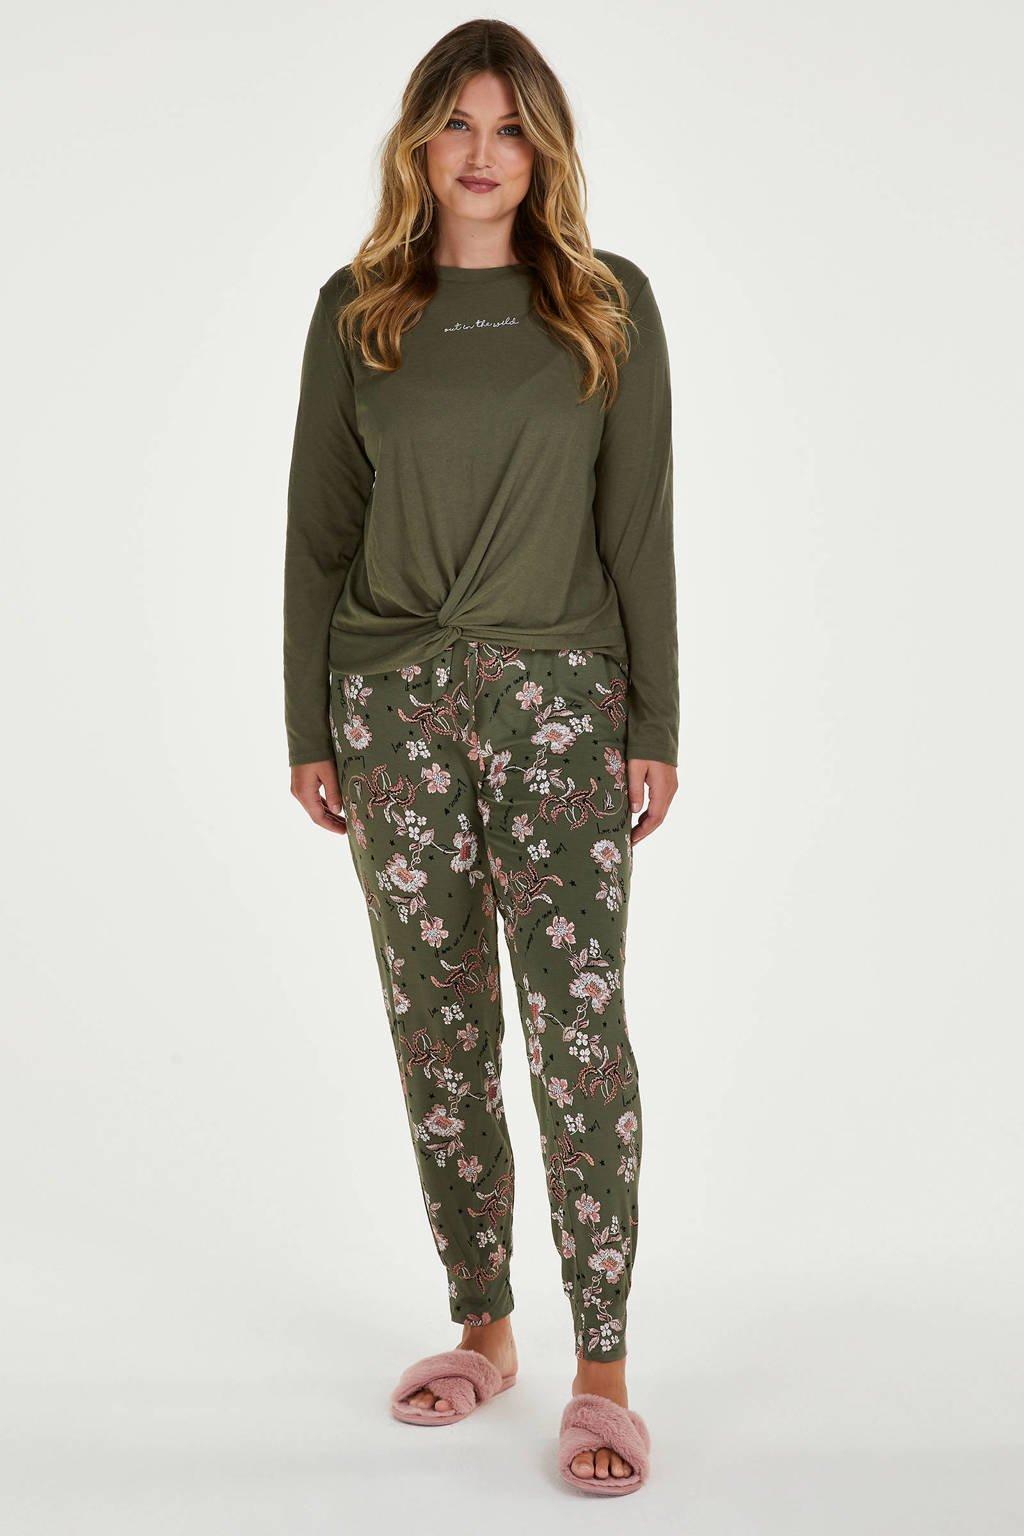 Hunkemöller gebloemde pyjamabroek groen/roze, Groen/roze